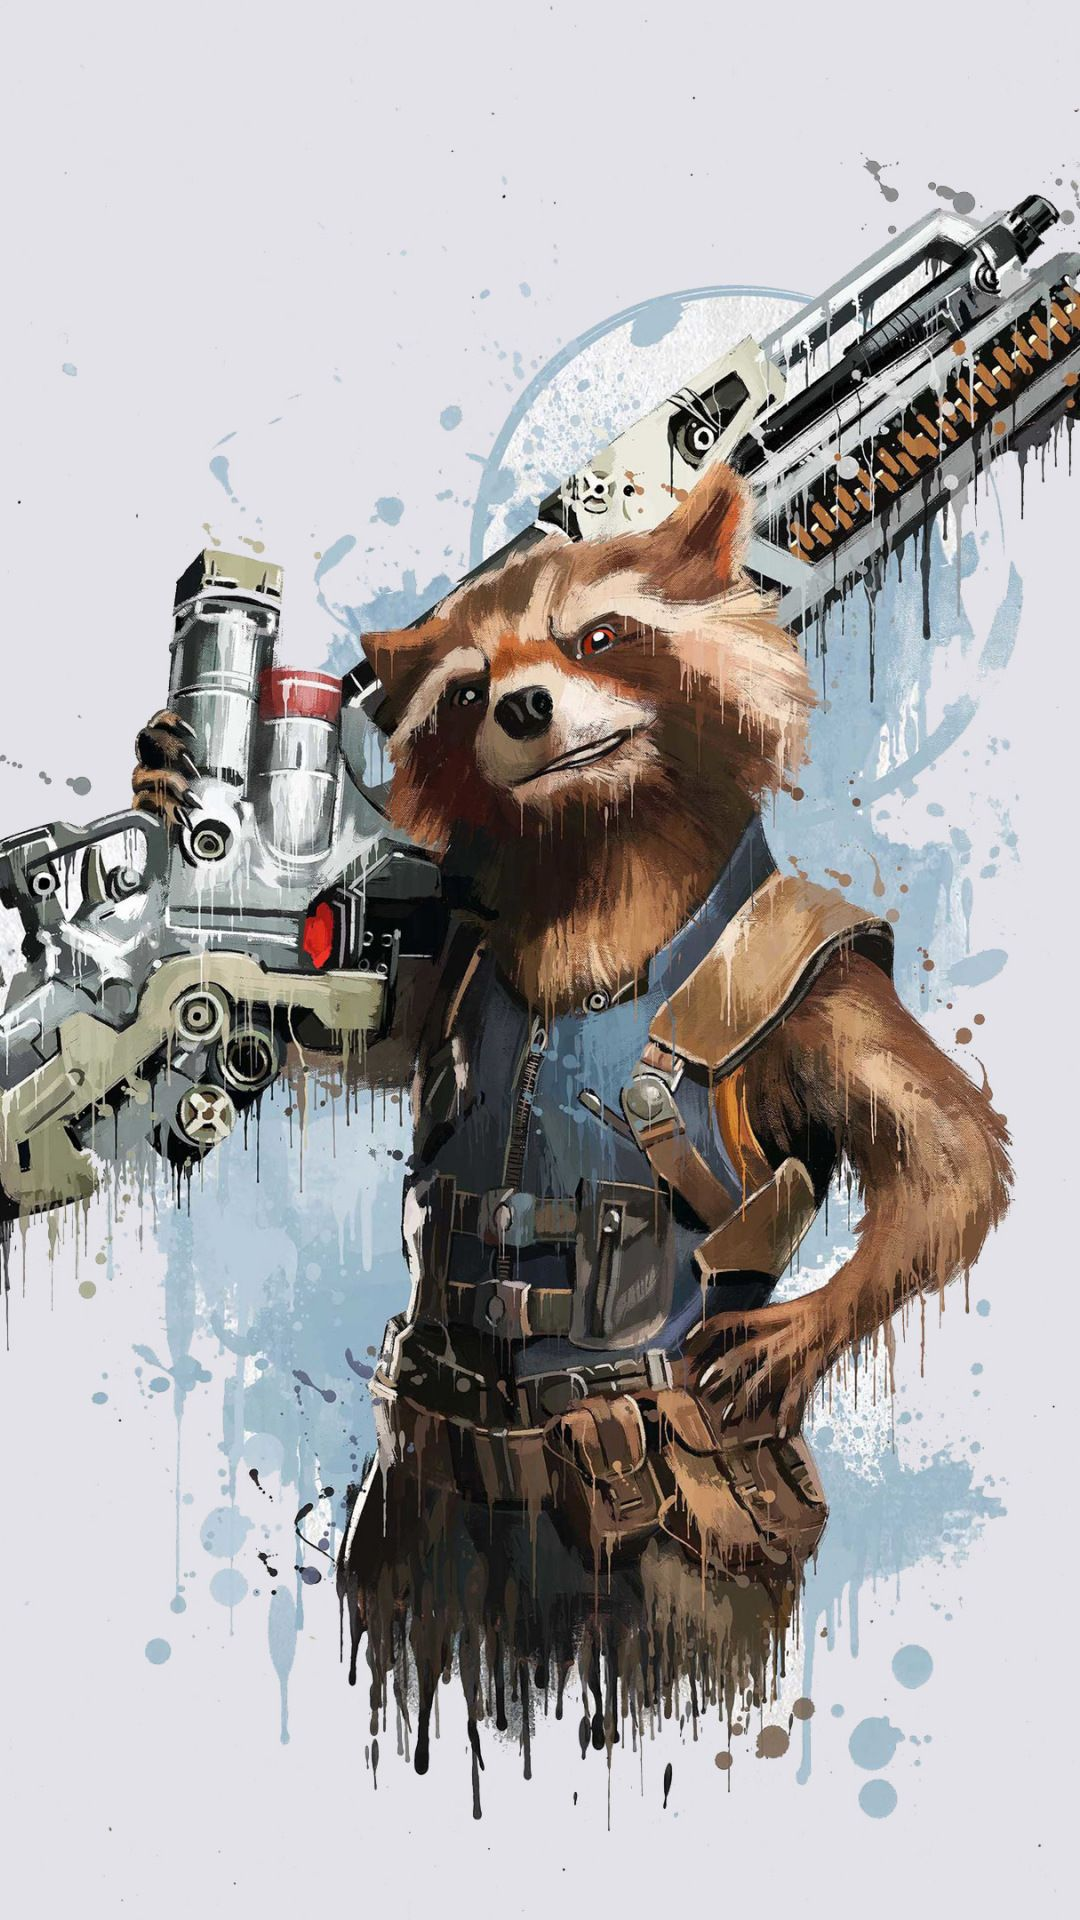 Download 1080x1920 Wallpaper Rocket Raccoon Avengers Infinity War Minimal Art 2018